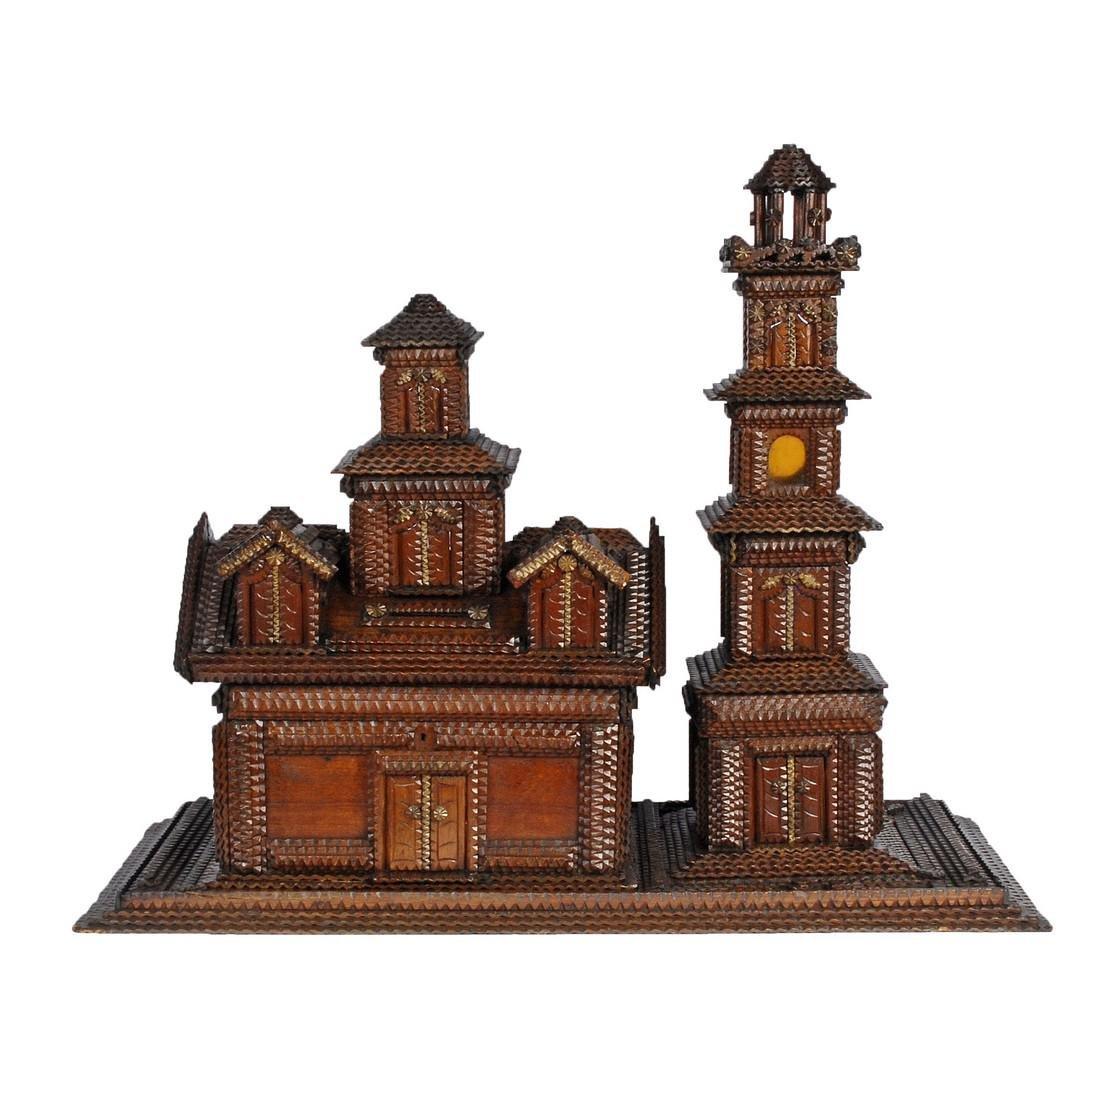 Folk Art Tramp Art House Shaped Box & Tower on Platform